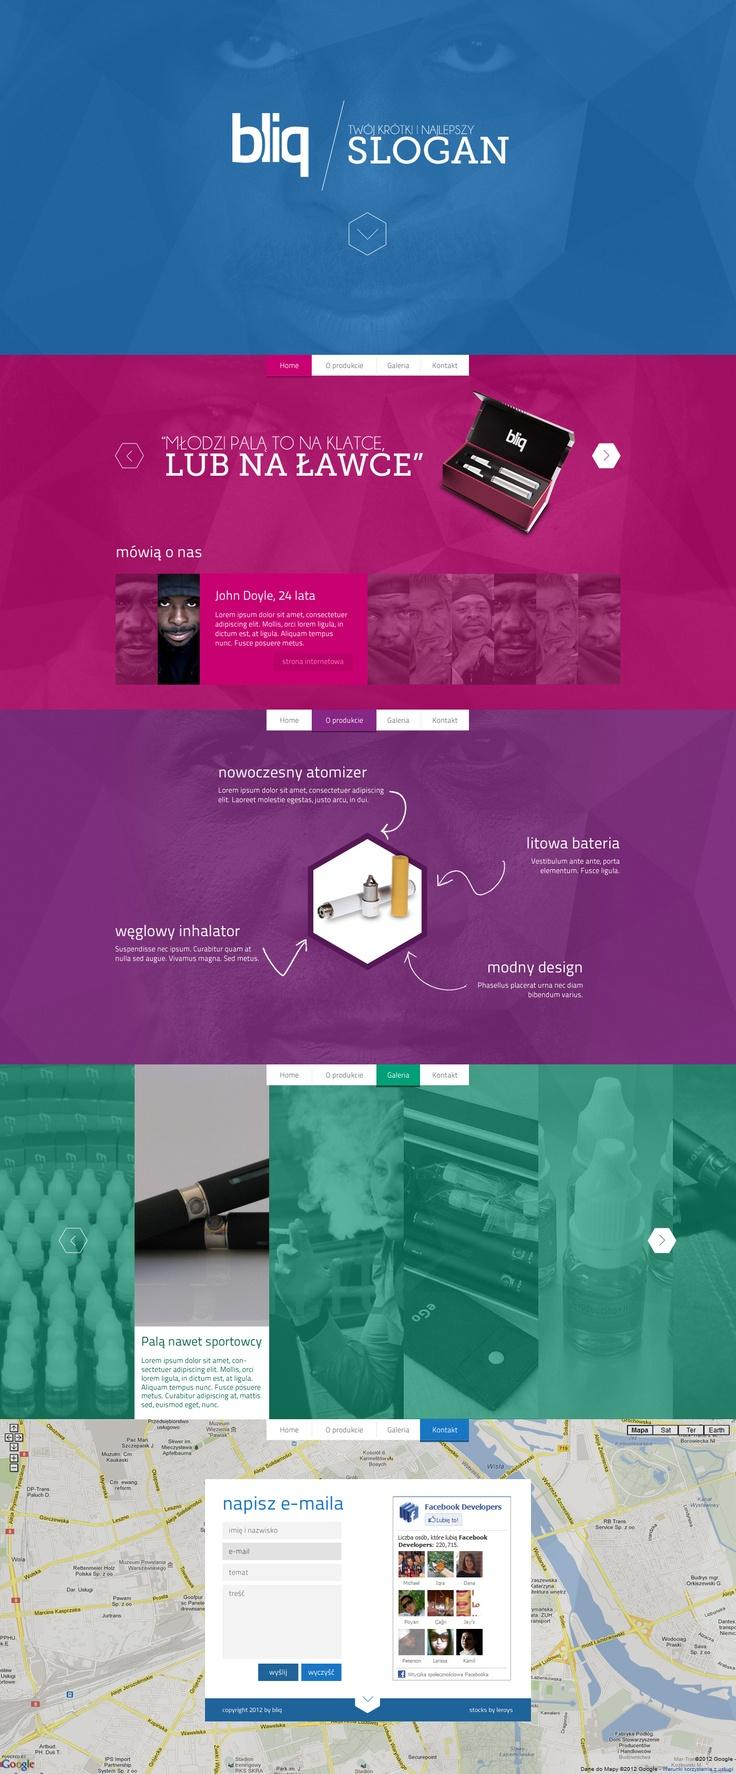 Lovely design layout